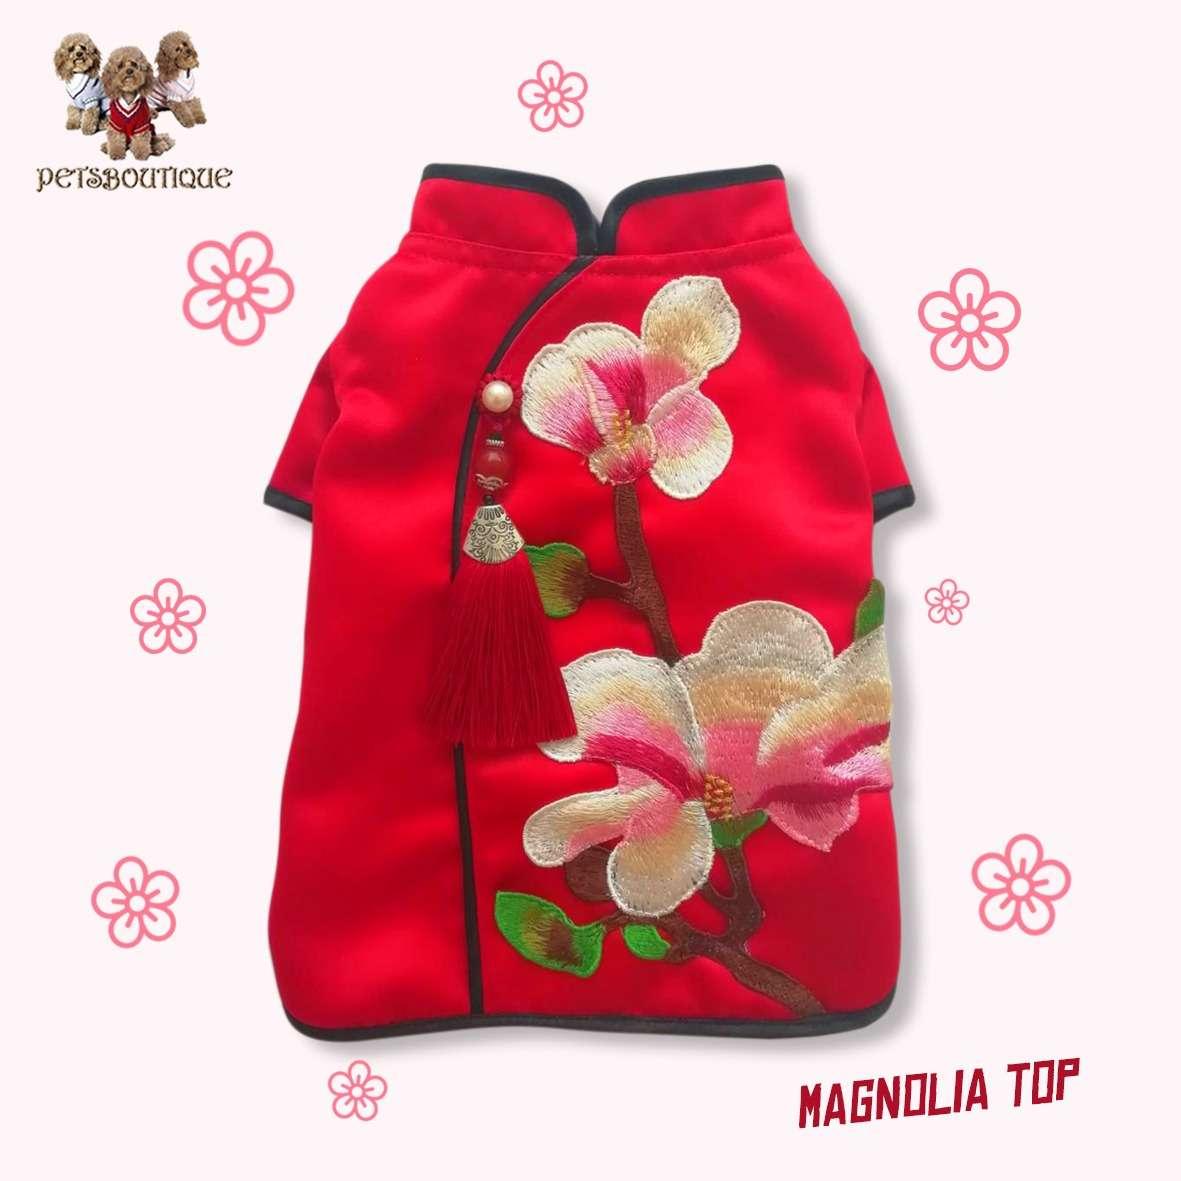 Petza - Chinese New Year Oriental - Magnolia Top Photo